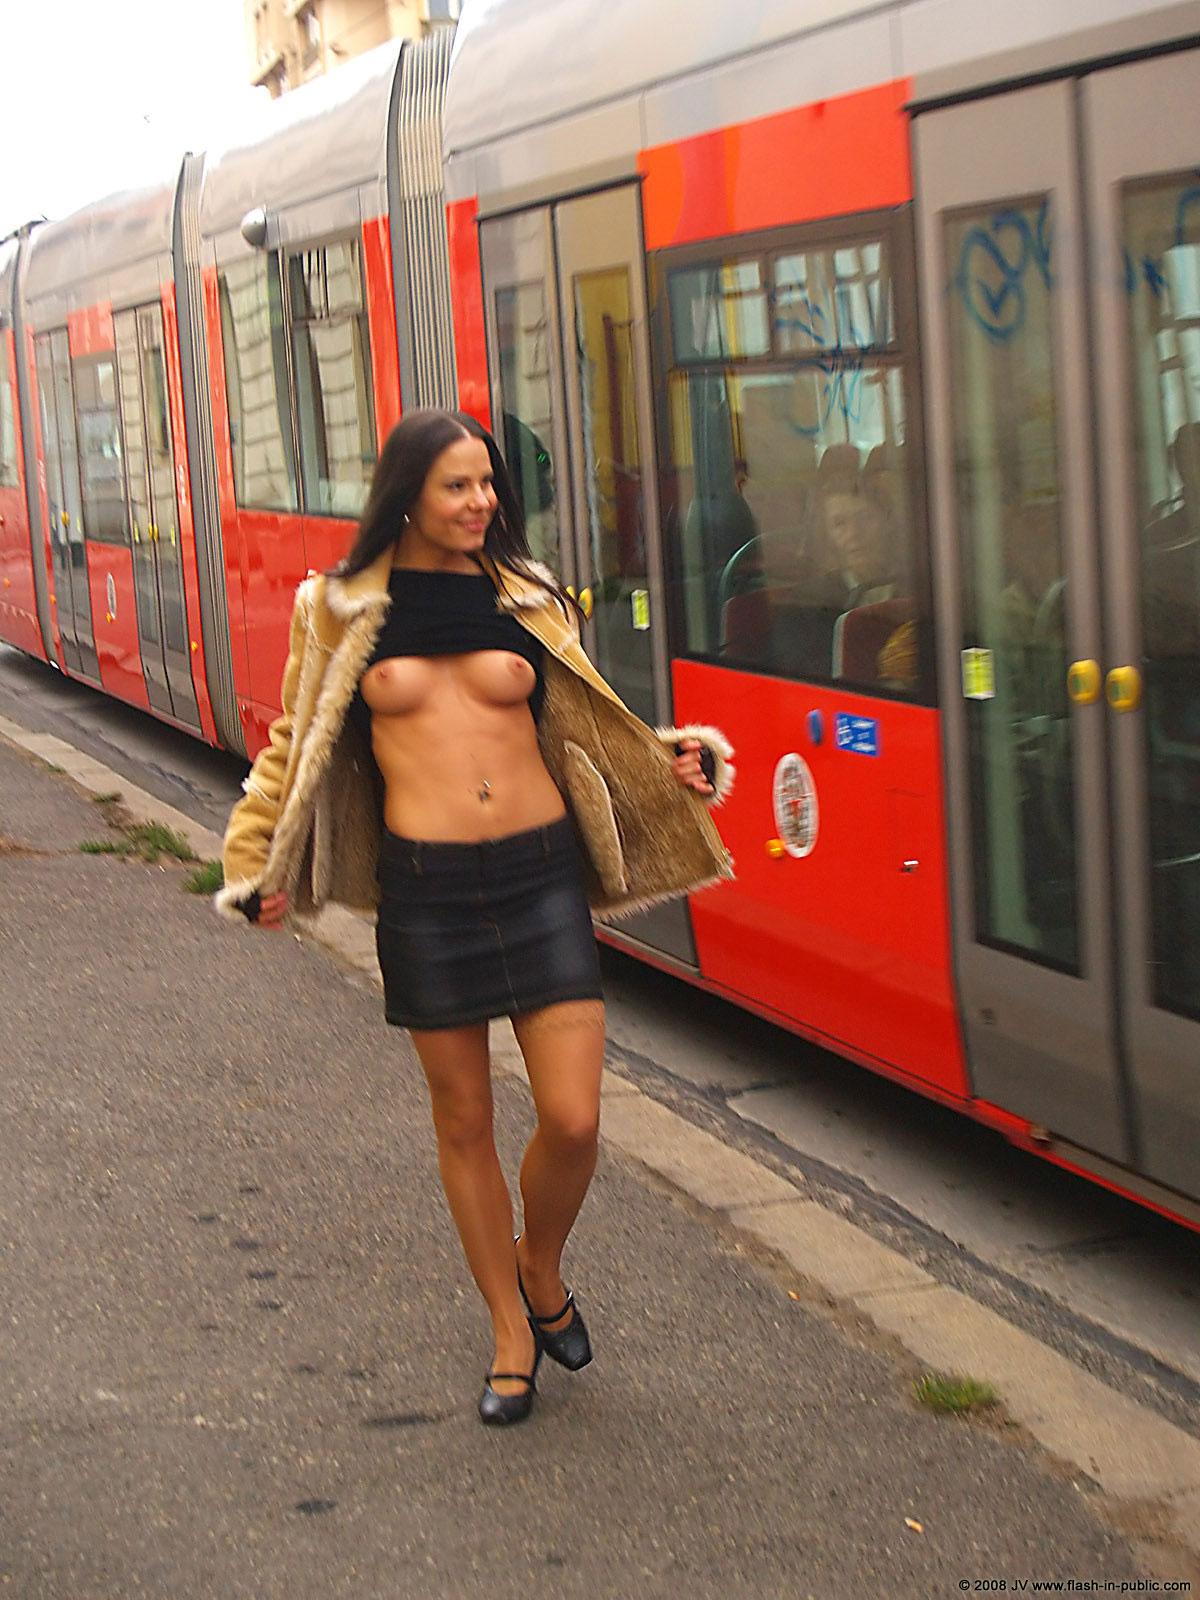 alexandra-g-bottomless-stockings-flash-in-public-37